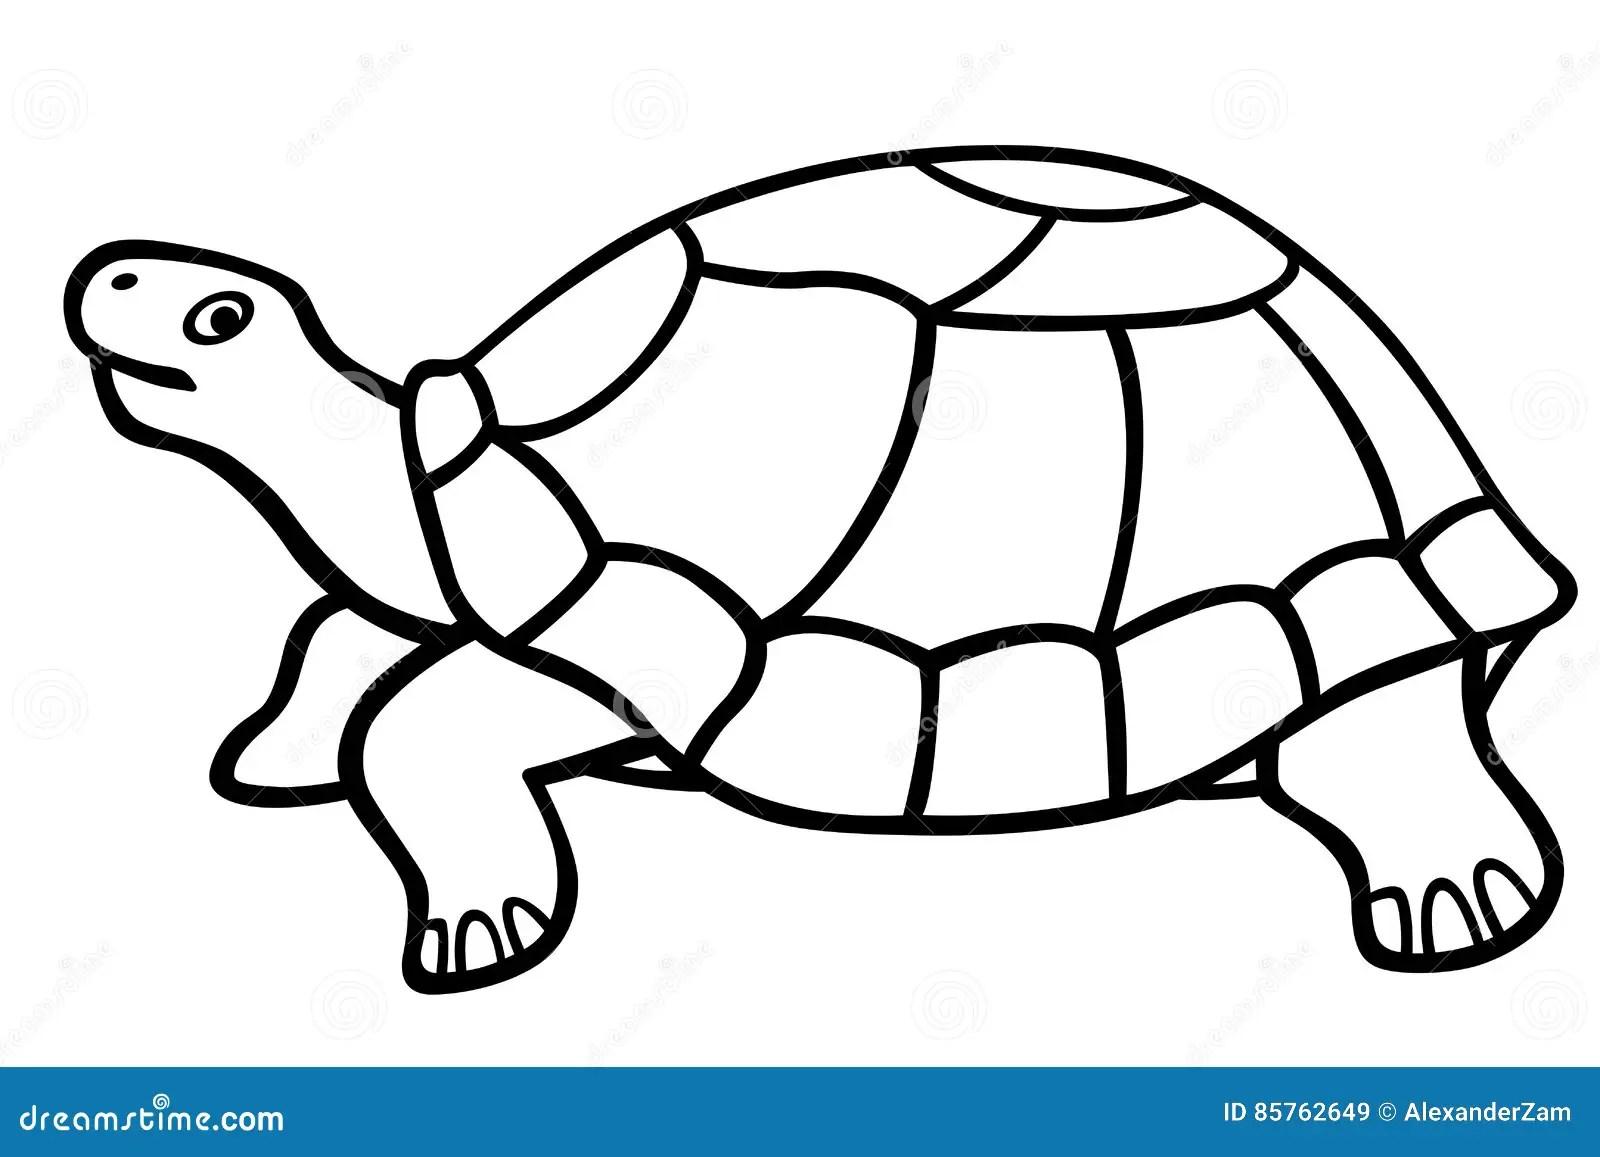 Turtle Contour Icon Stock Vector Illustration Of Tortoise